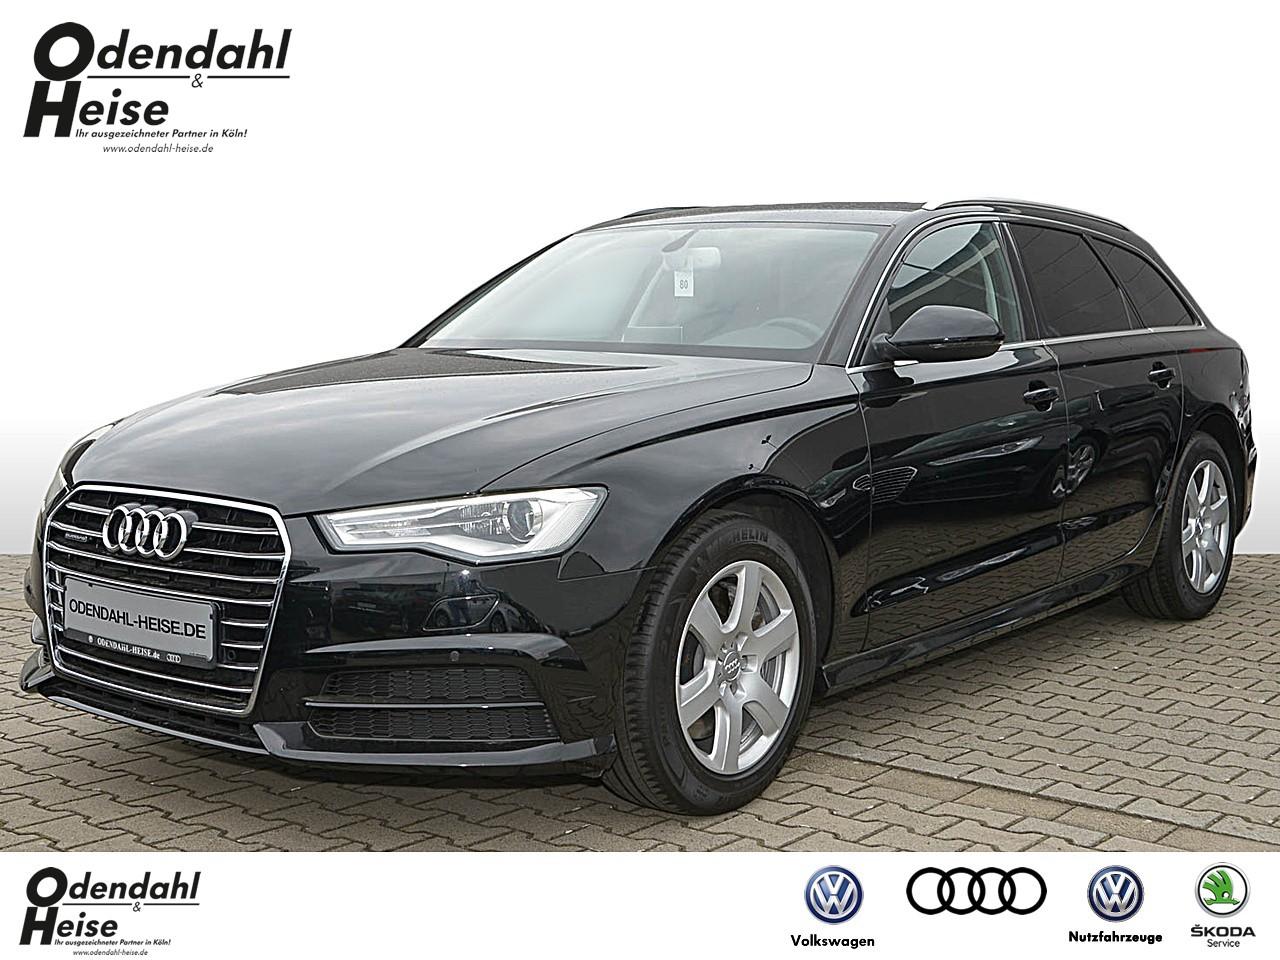 Audi A6 Avant 3.0 TDI quattro S tronic EU6 Klima, Jahr 2017, Diesel